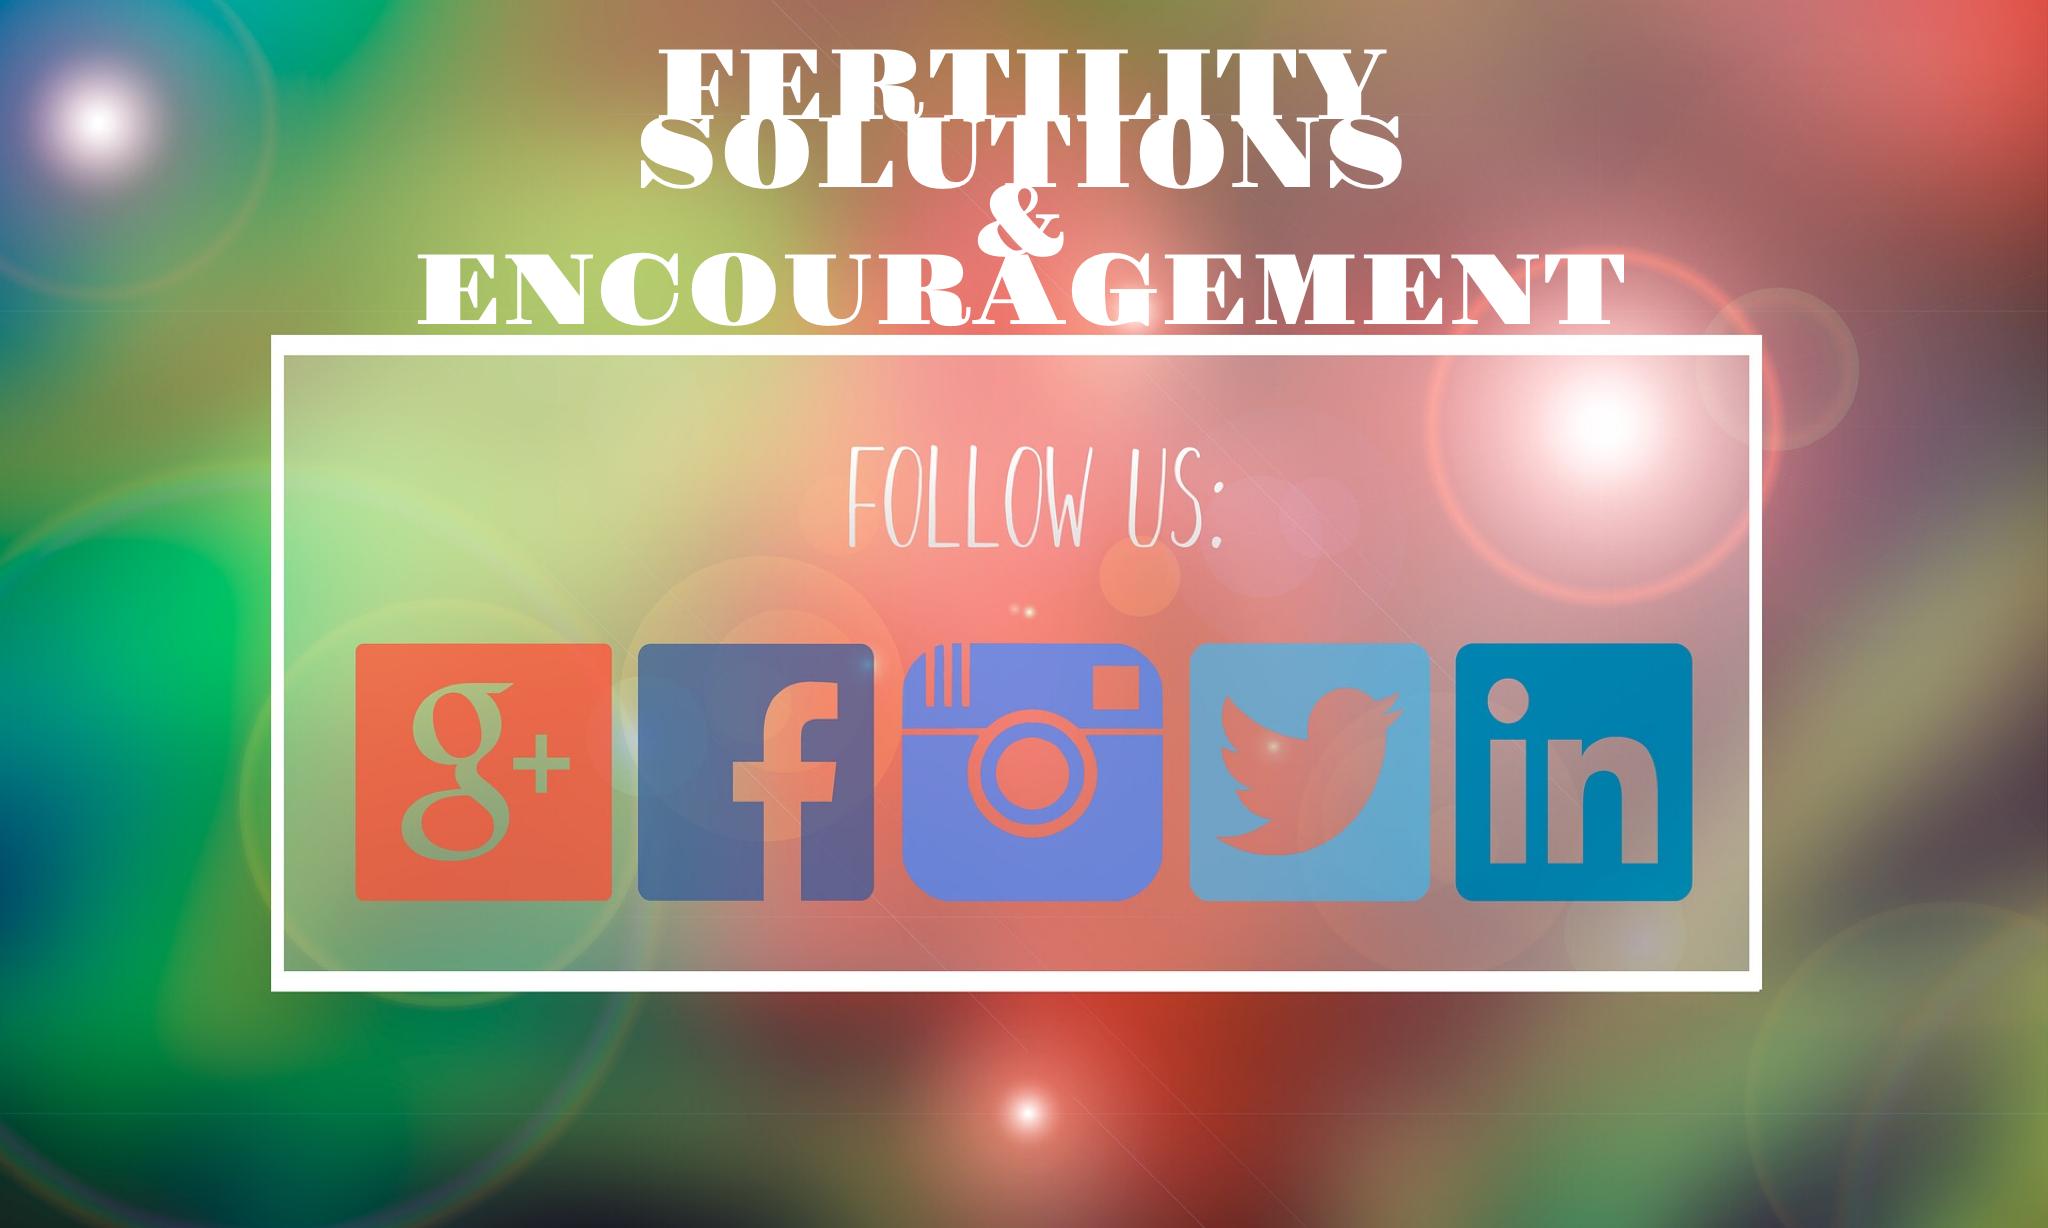 Fertility & encouragement